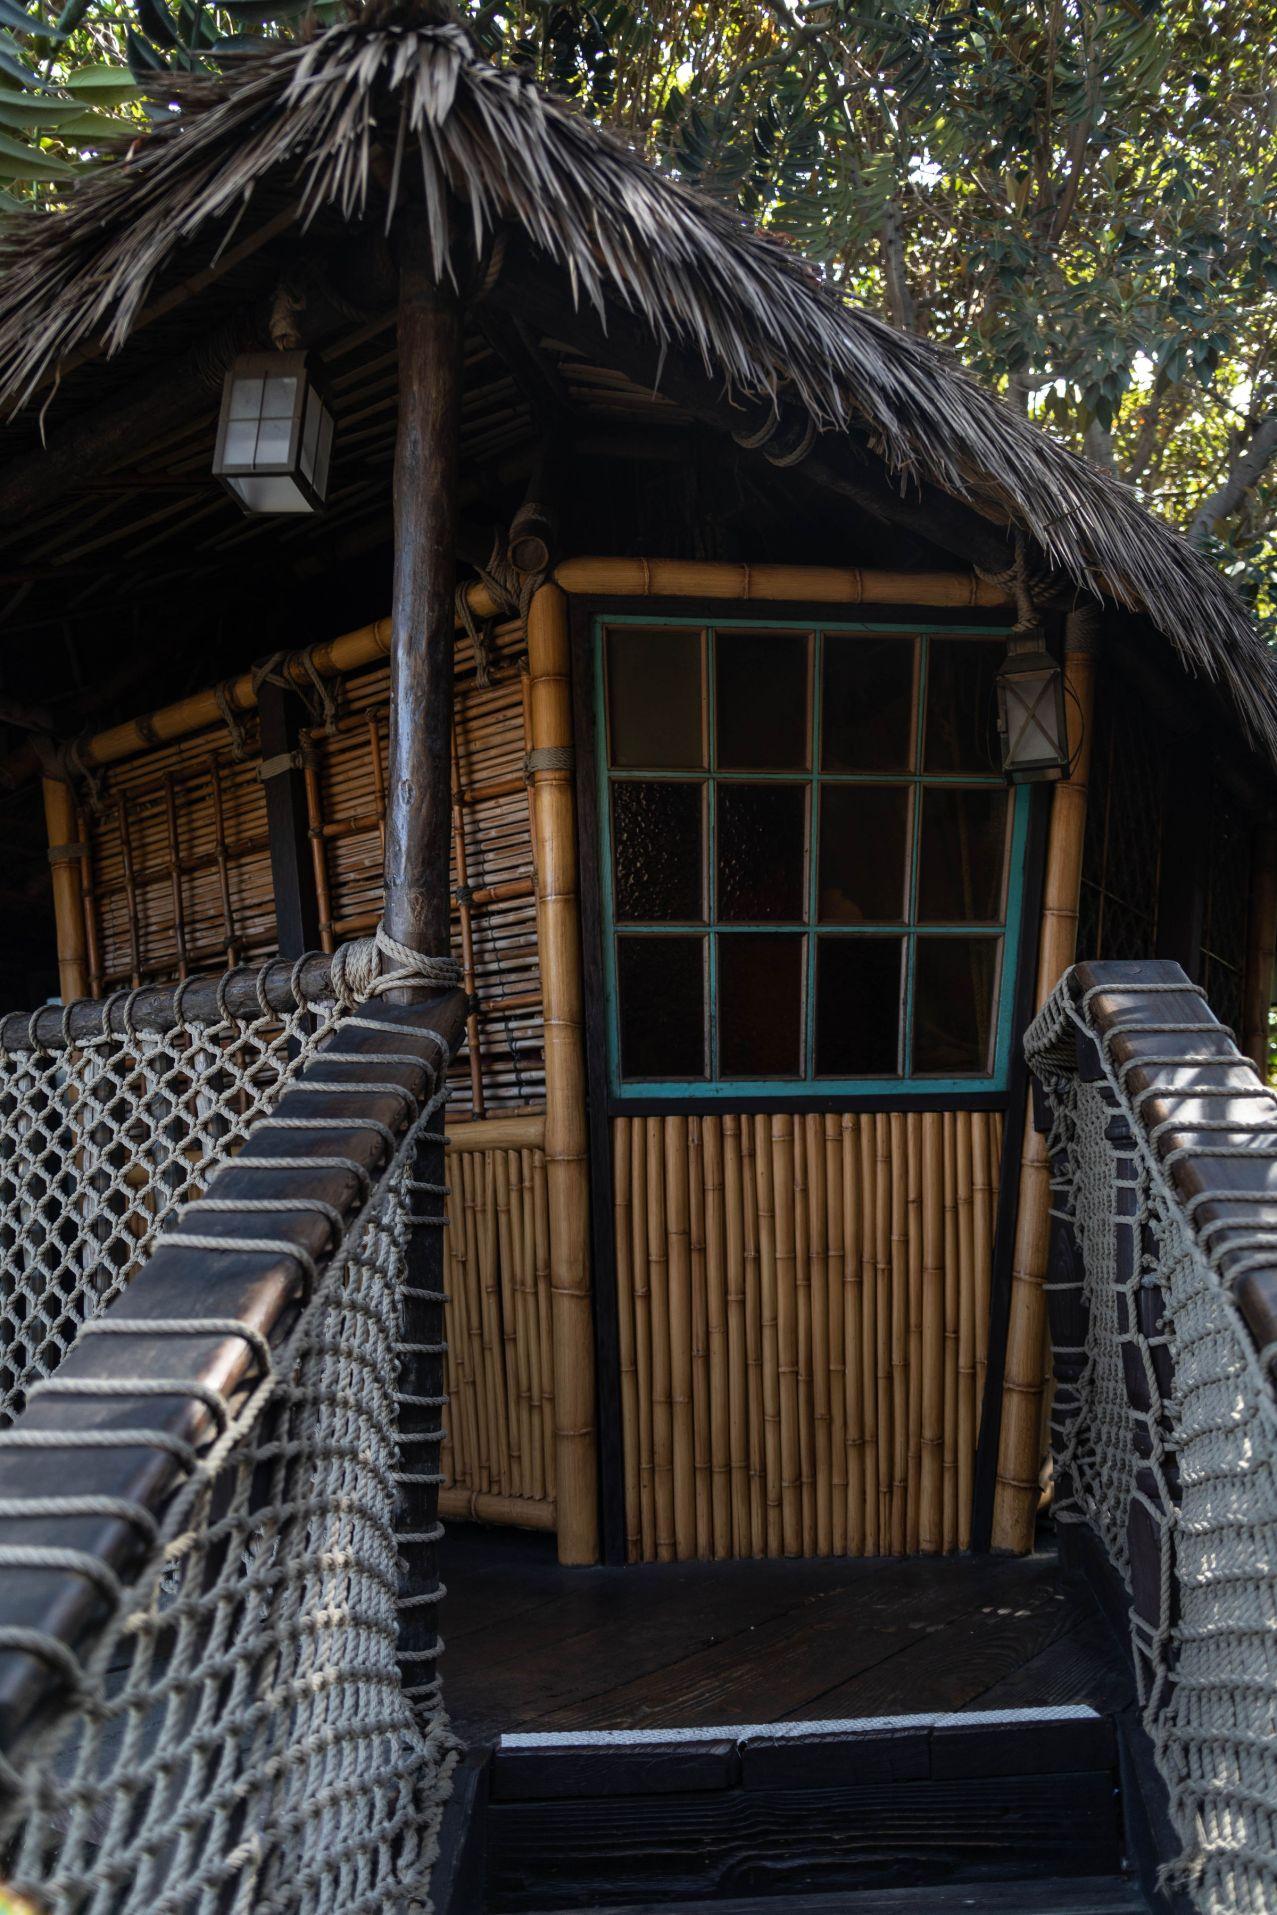 Disneyland The Ultimate Travel Guide by Annie Fairfax Disneyland Travel Tips Advice Adventureland Tarzan's Treehouse